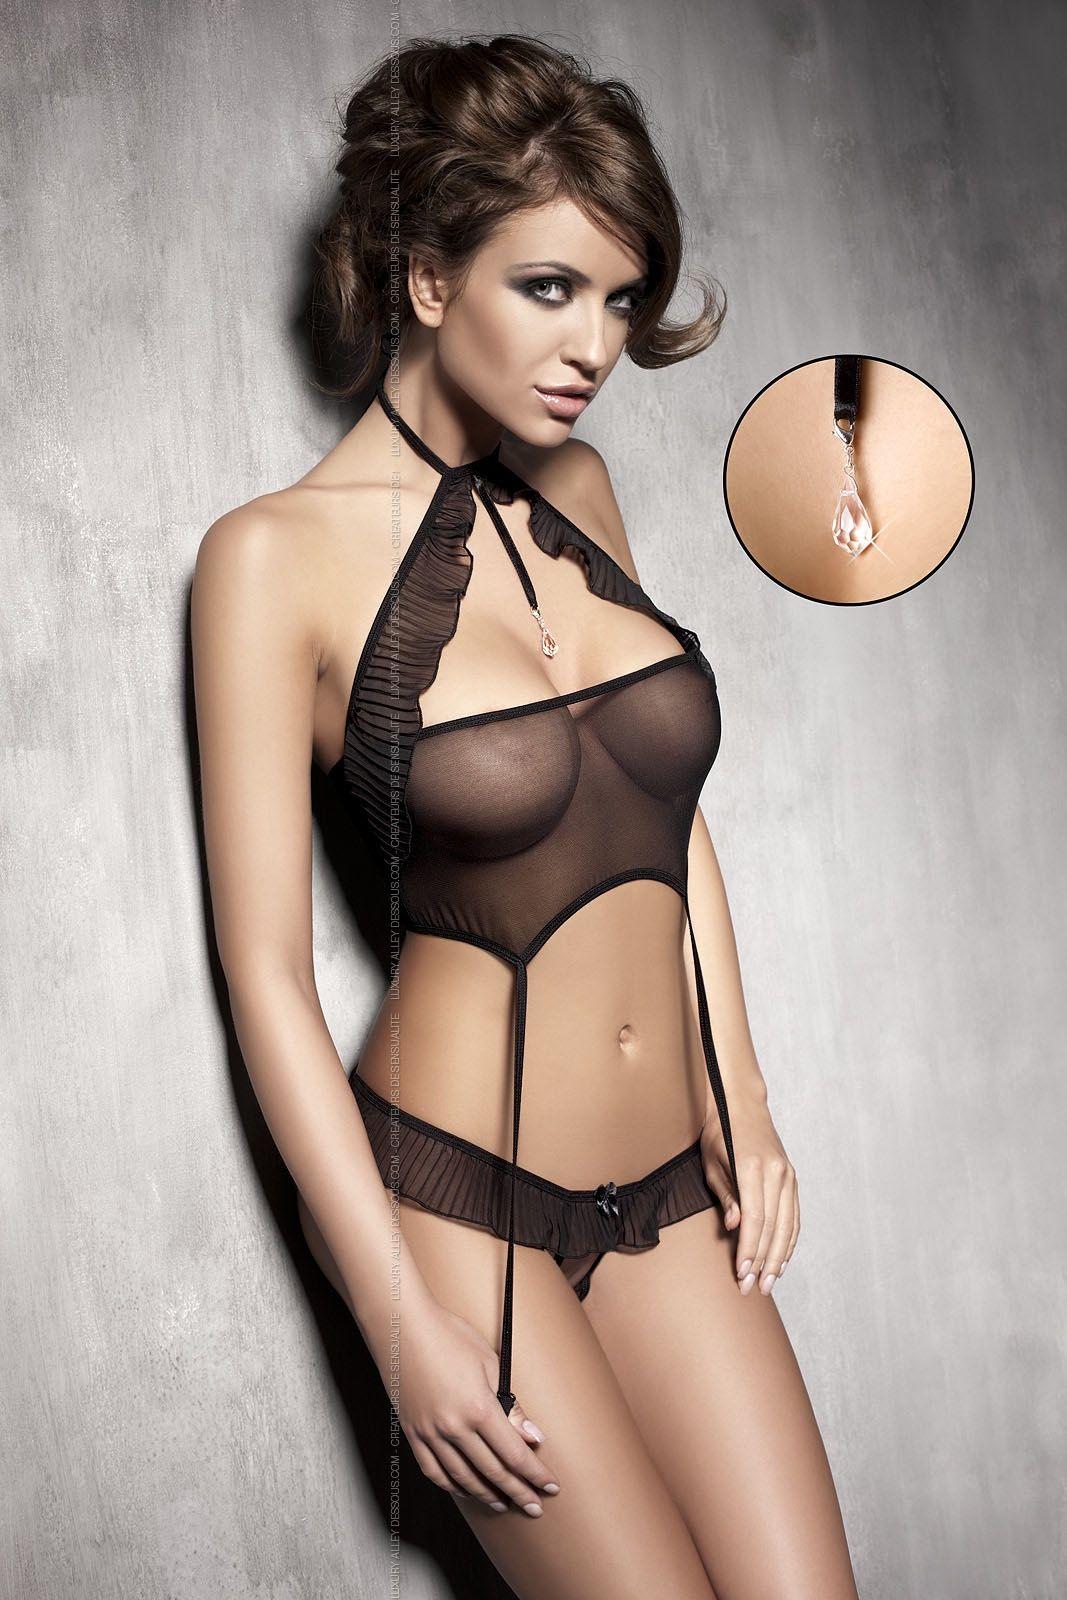 ensemble spice up | inspiration: fine lingerie | pinterest | polish